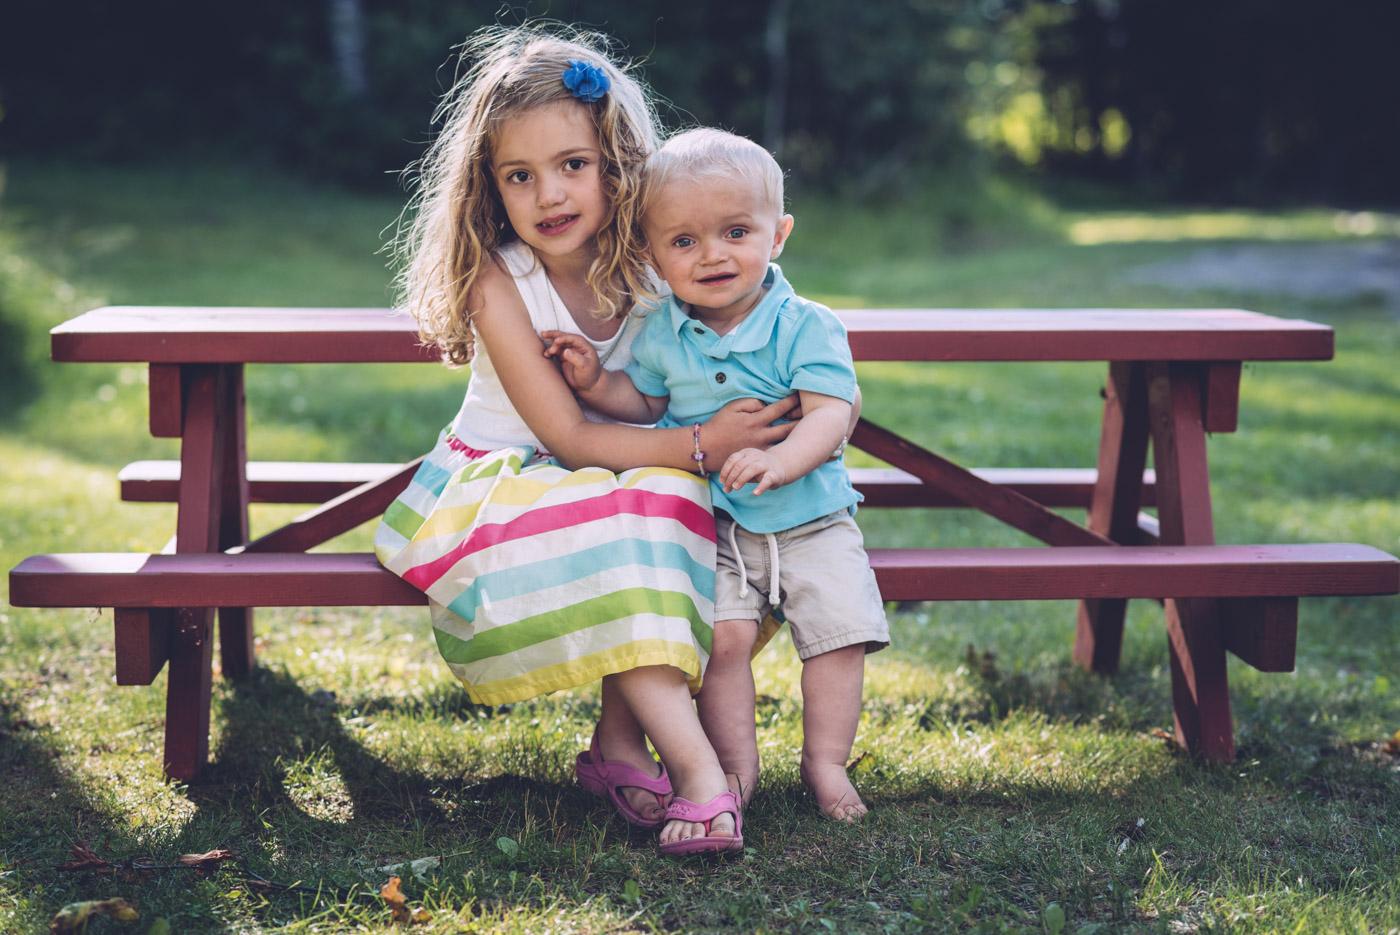 vicki_lincoln_familyportraits_blog9.jpg